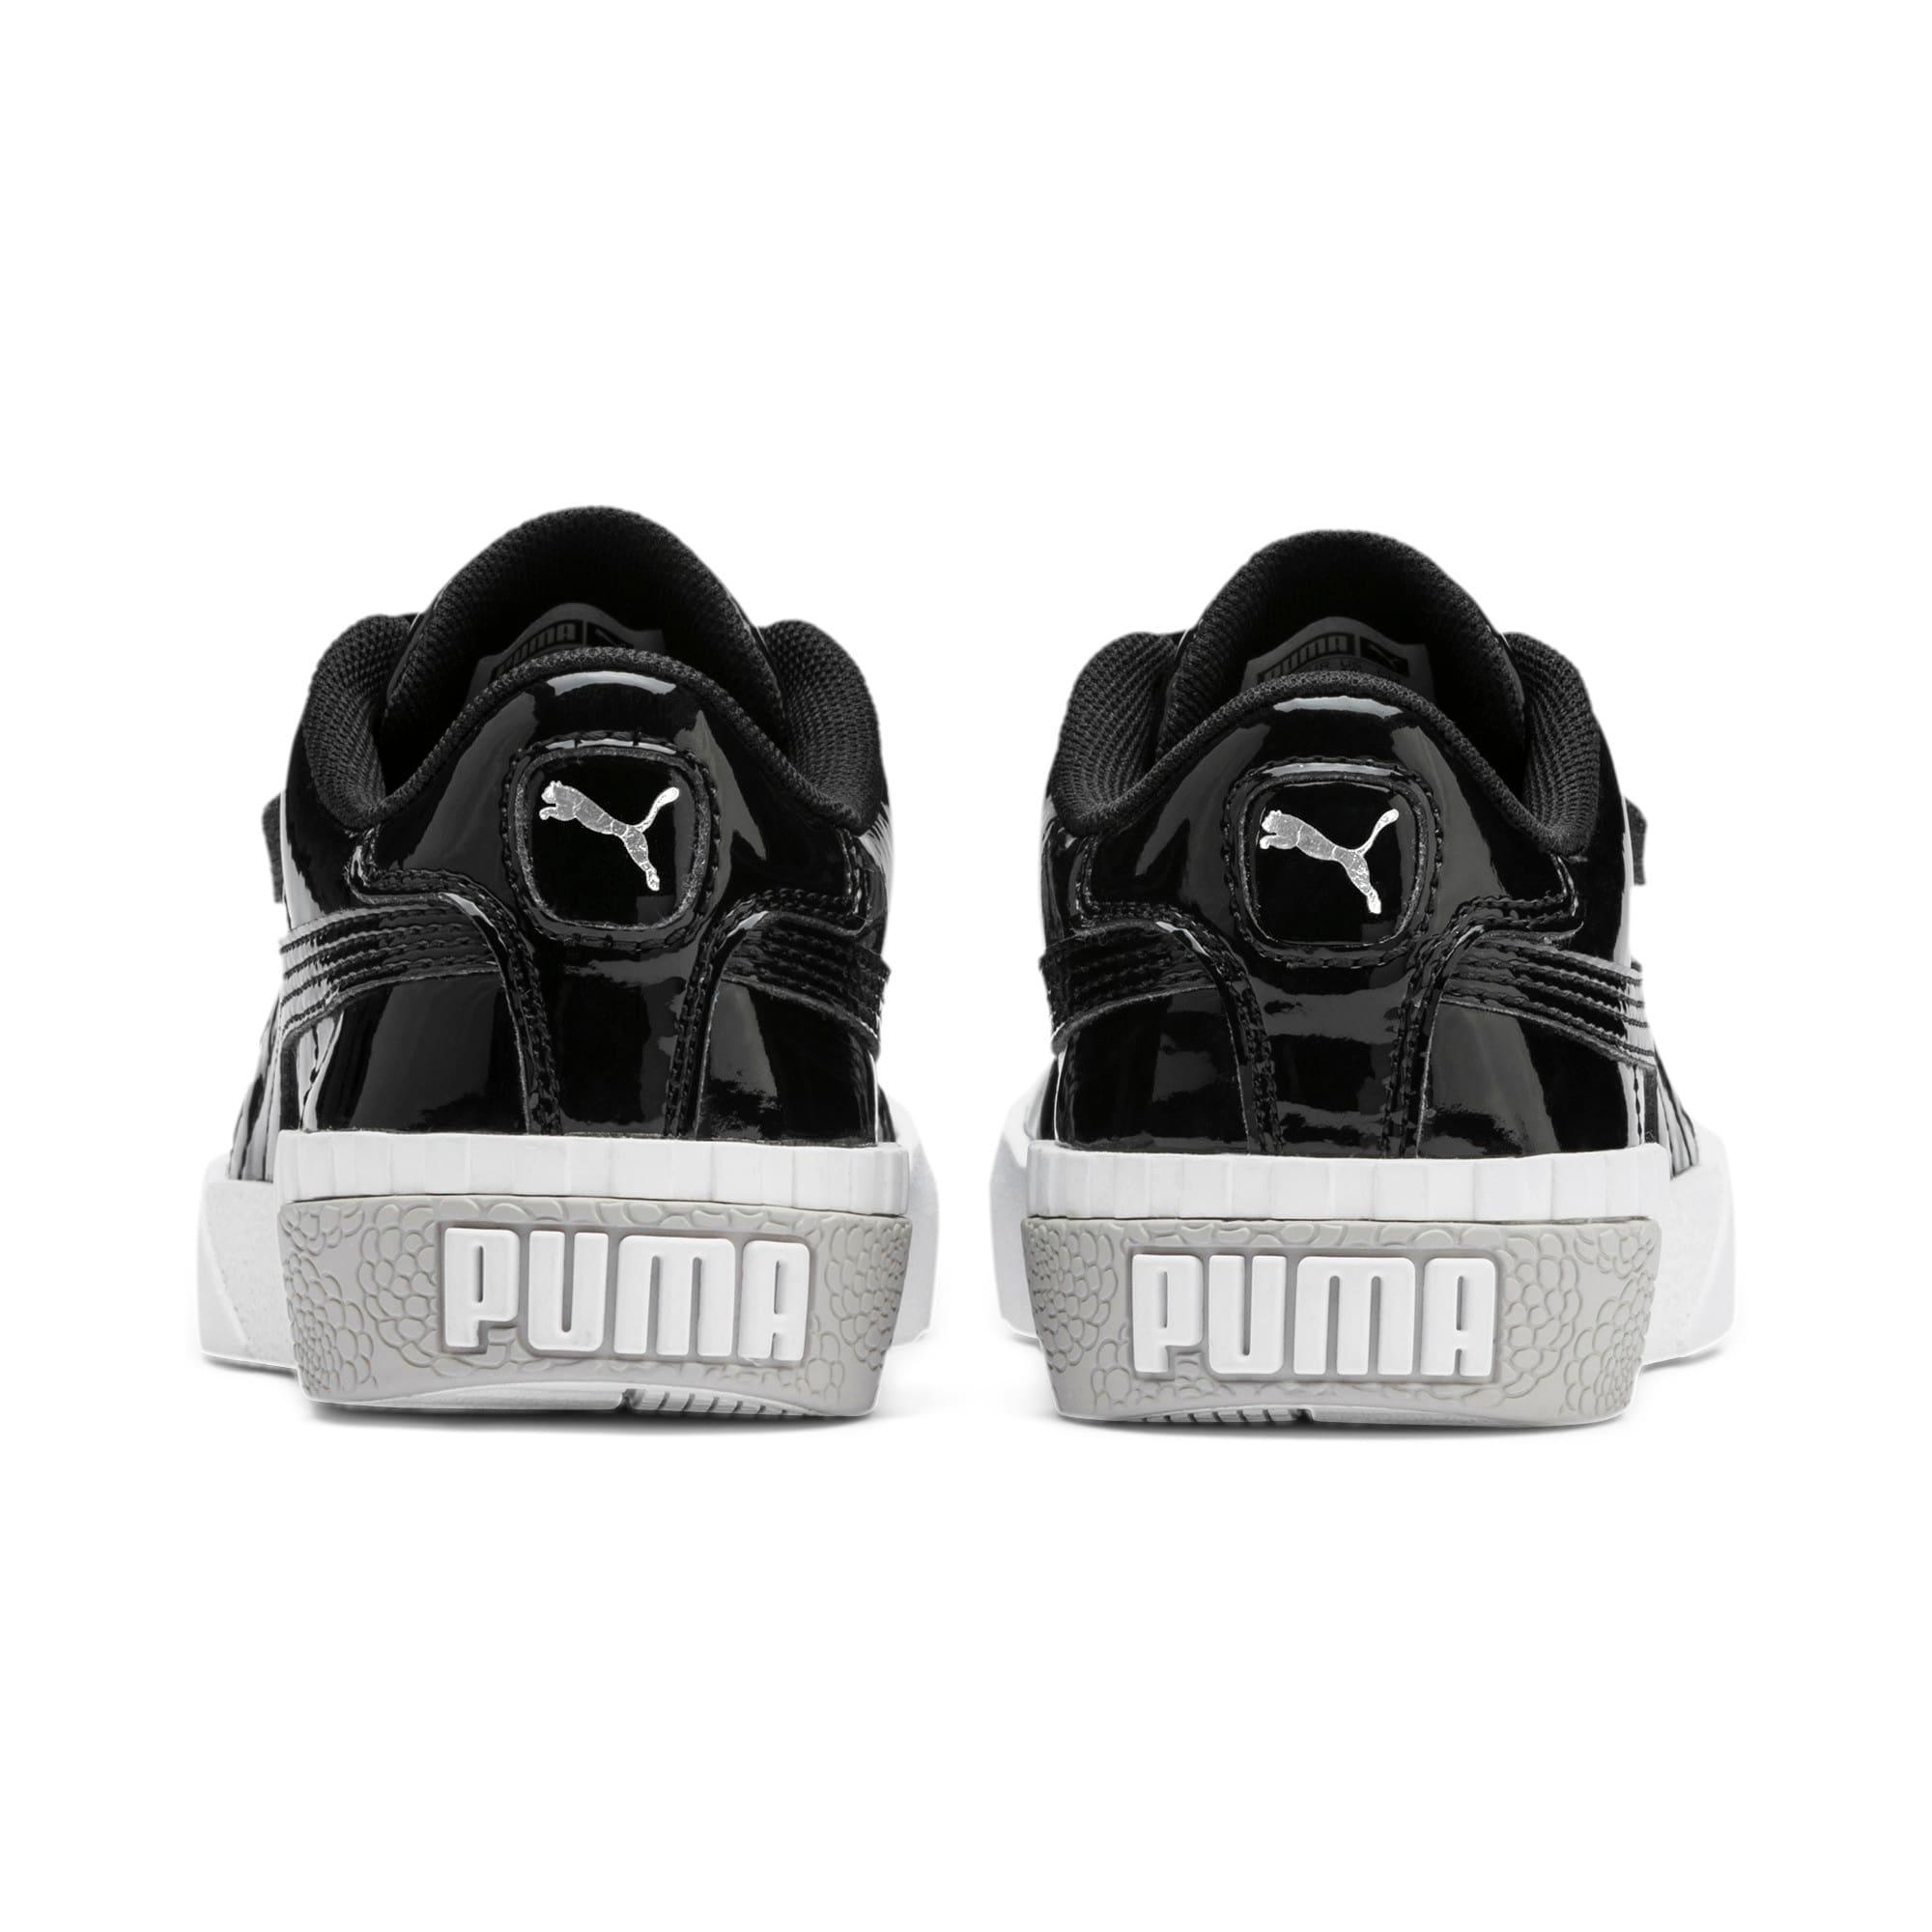 Thumbnail 3 of Cali Patent Kids' Trainers, Puma Black-Puma White, medium